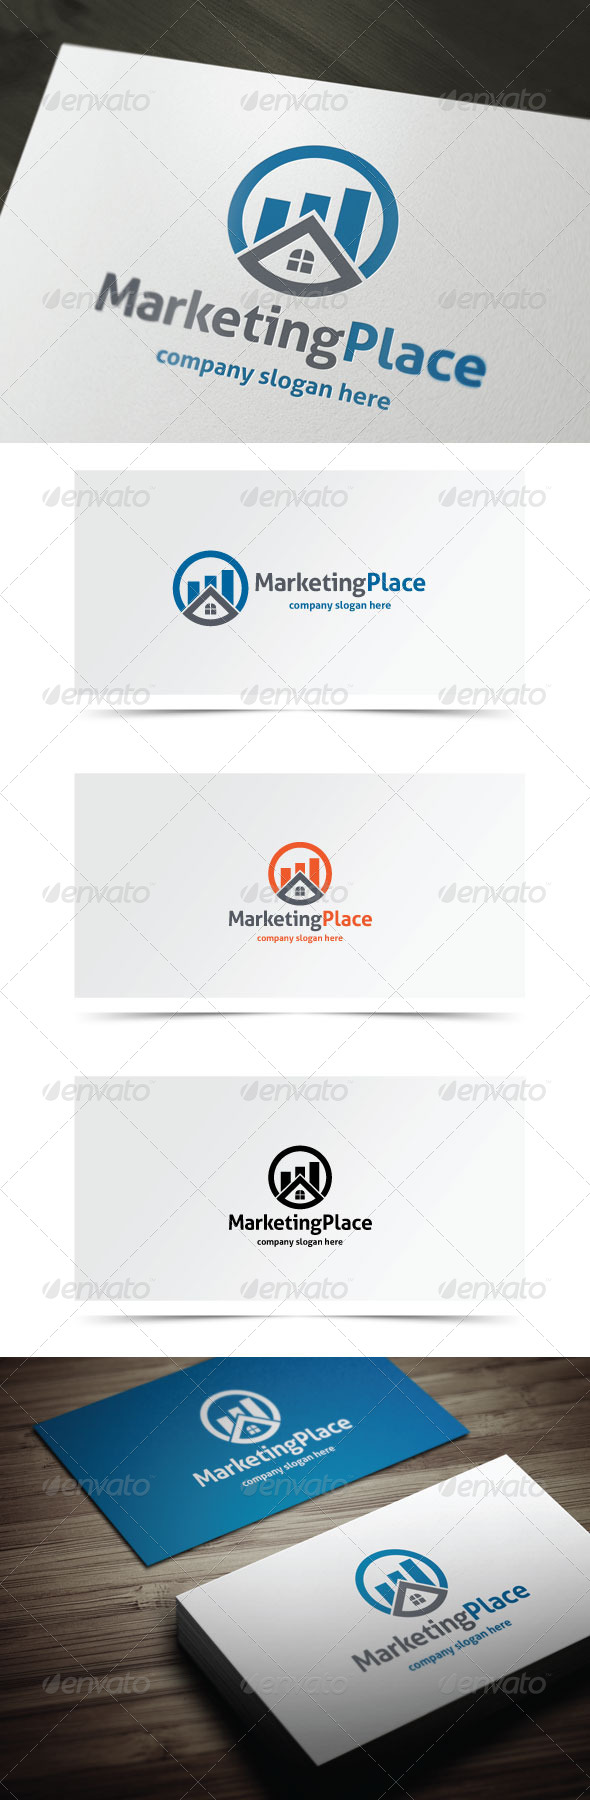 GraphicRiver Marketing Place 6674012